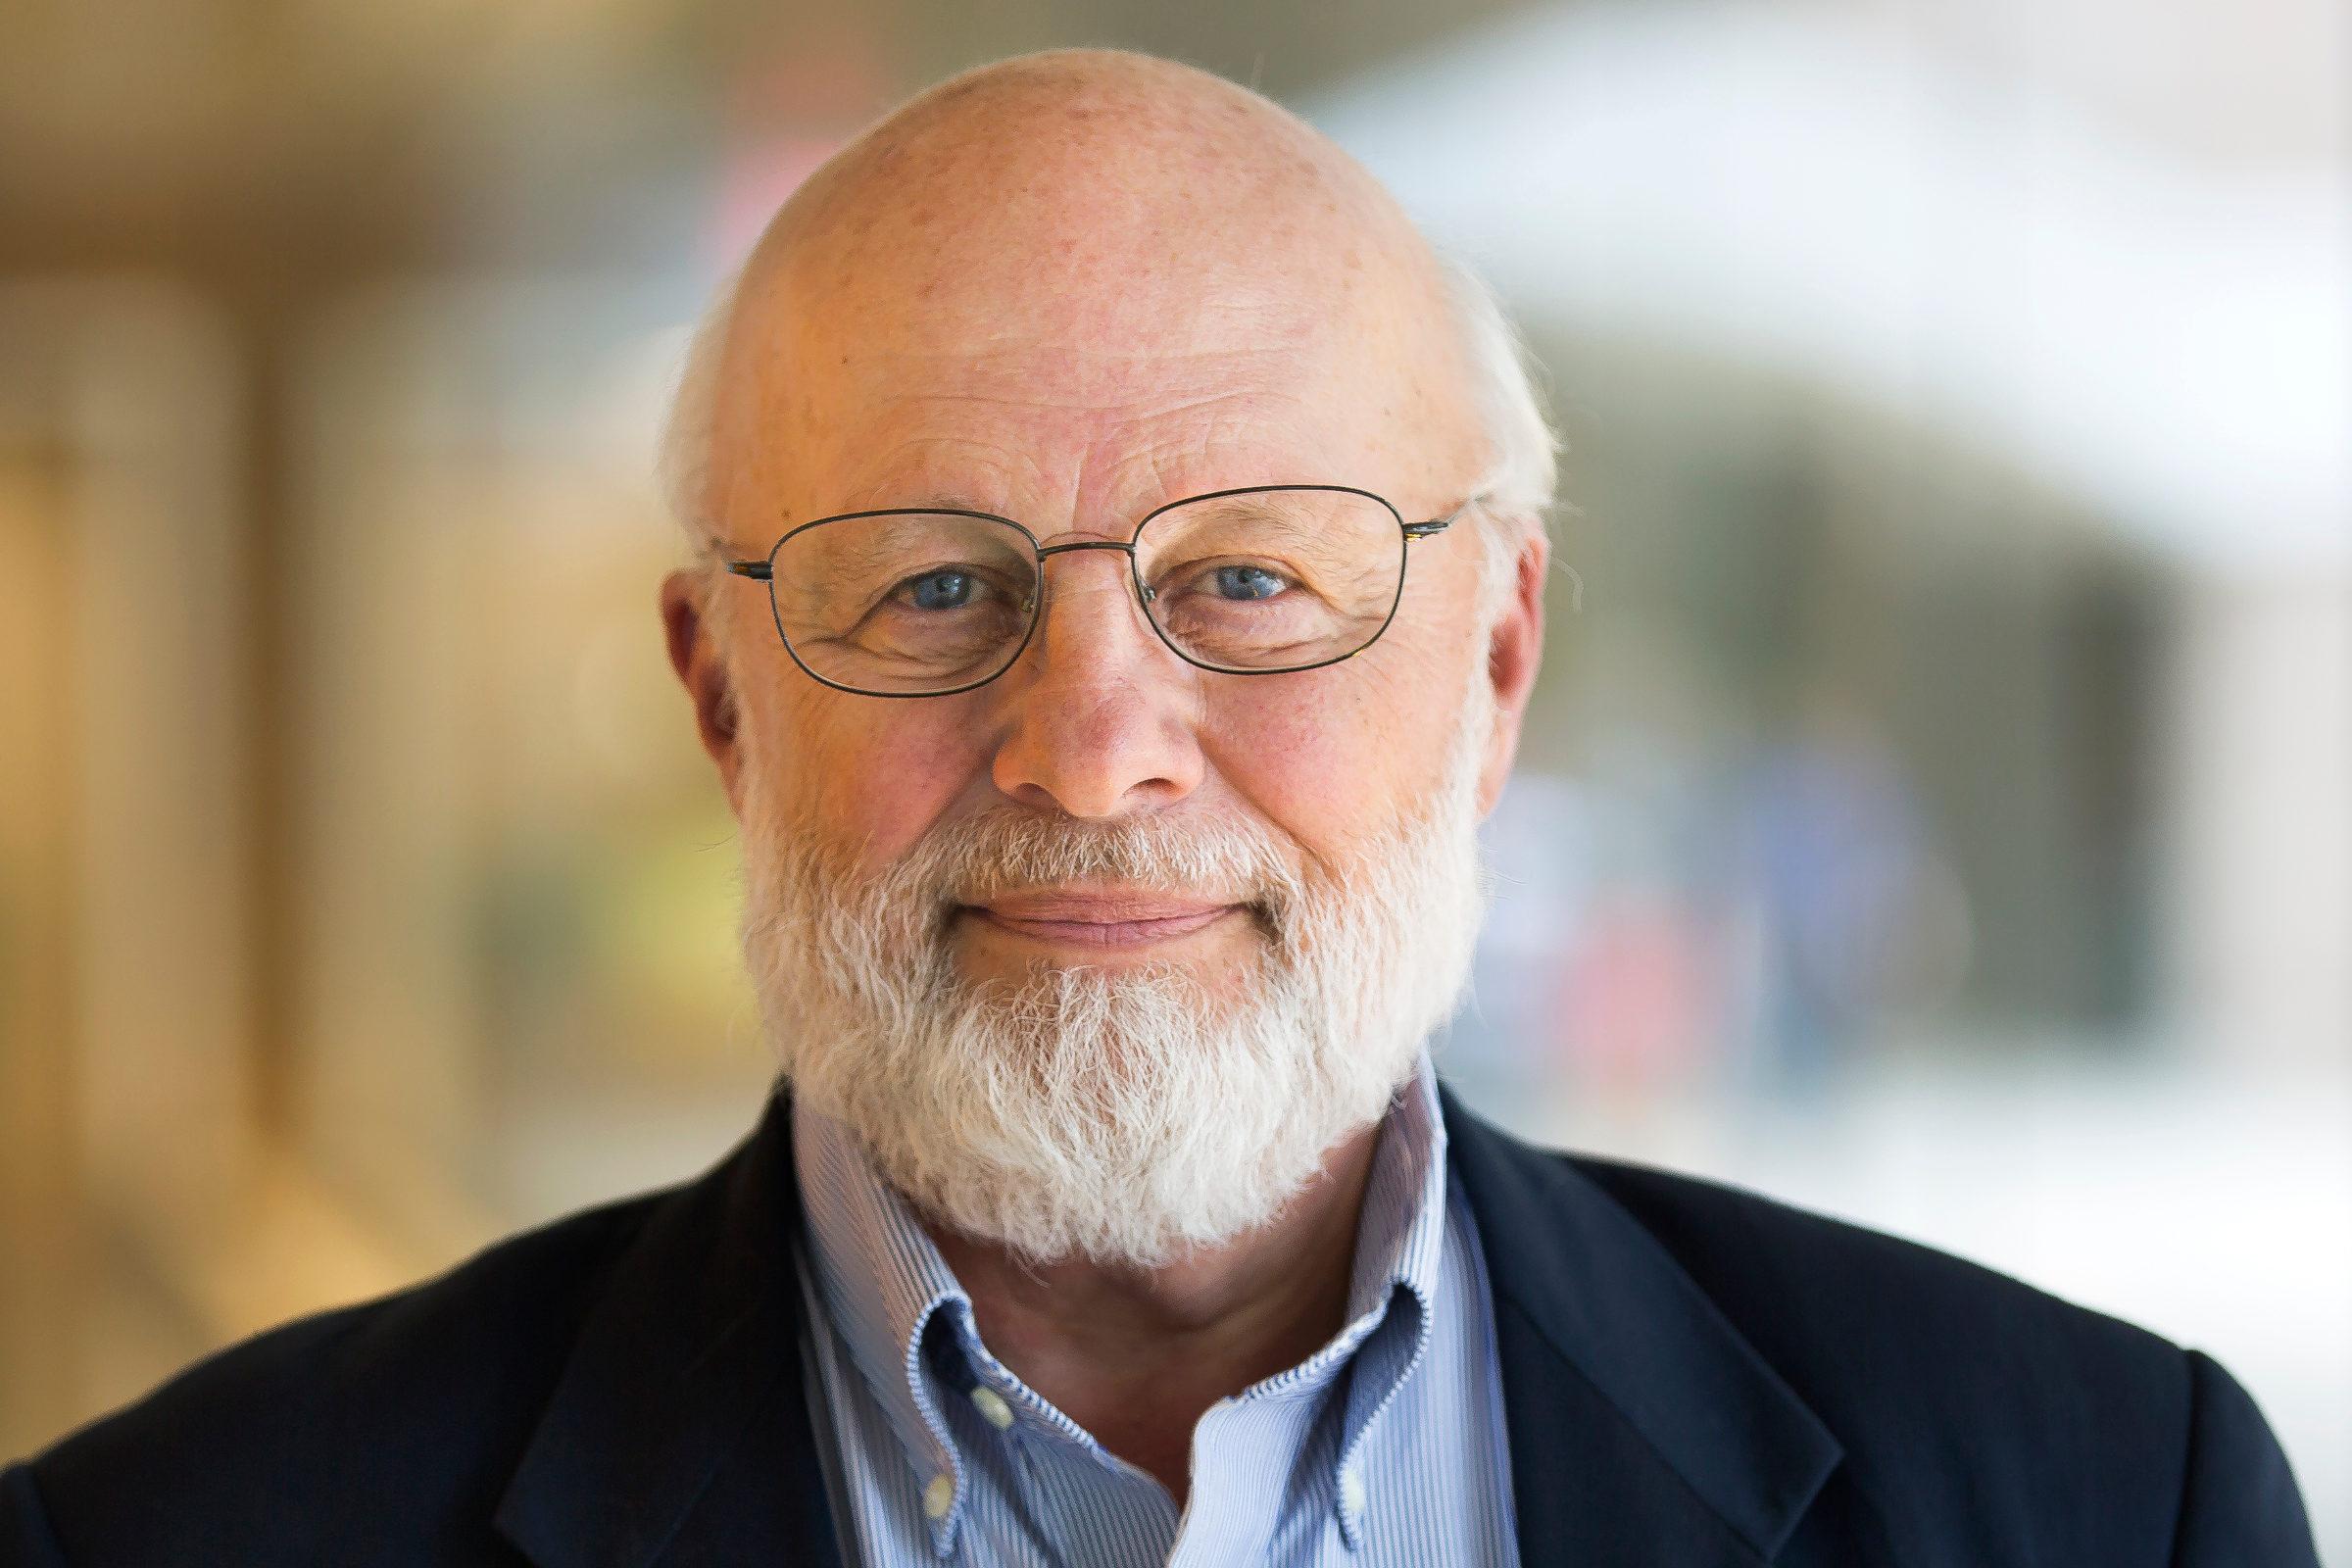 Congratulations to Dan Inman on being named Harm Burning Collegiate Professor of Aerospace Engineering